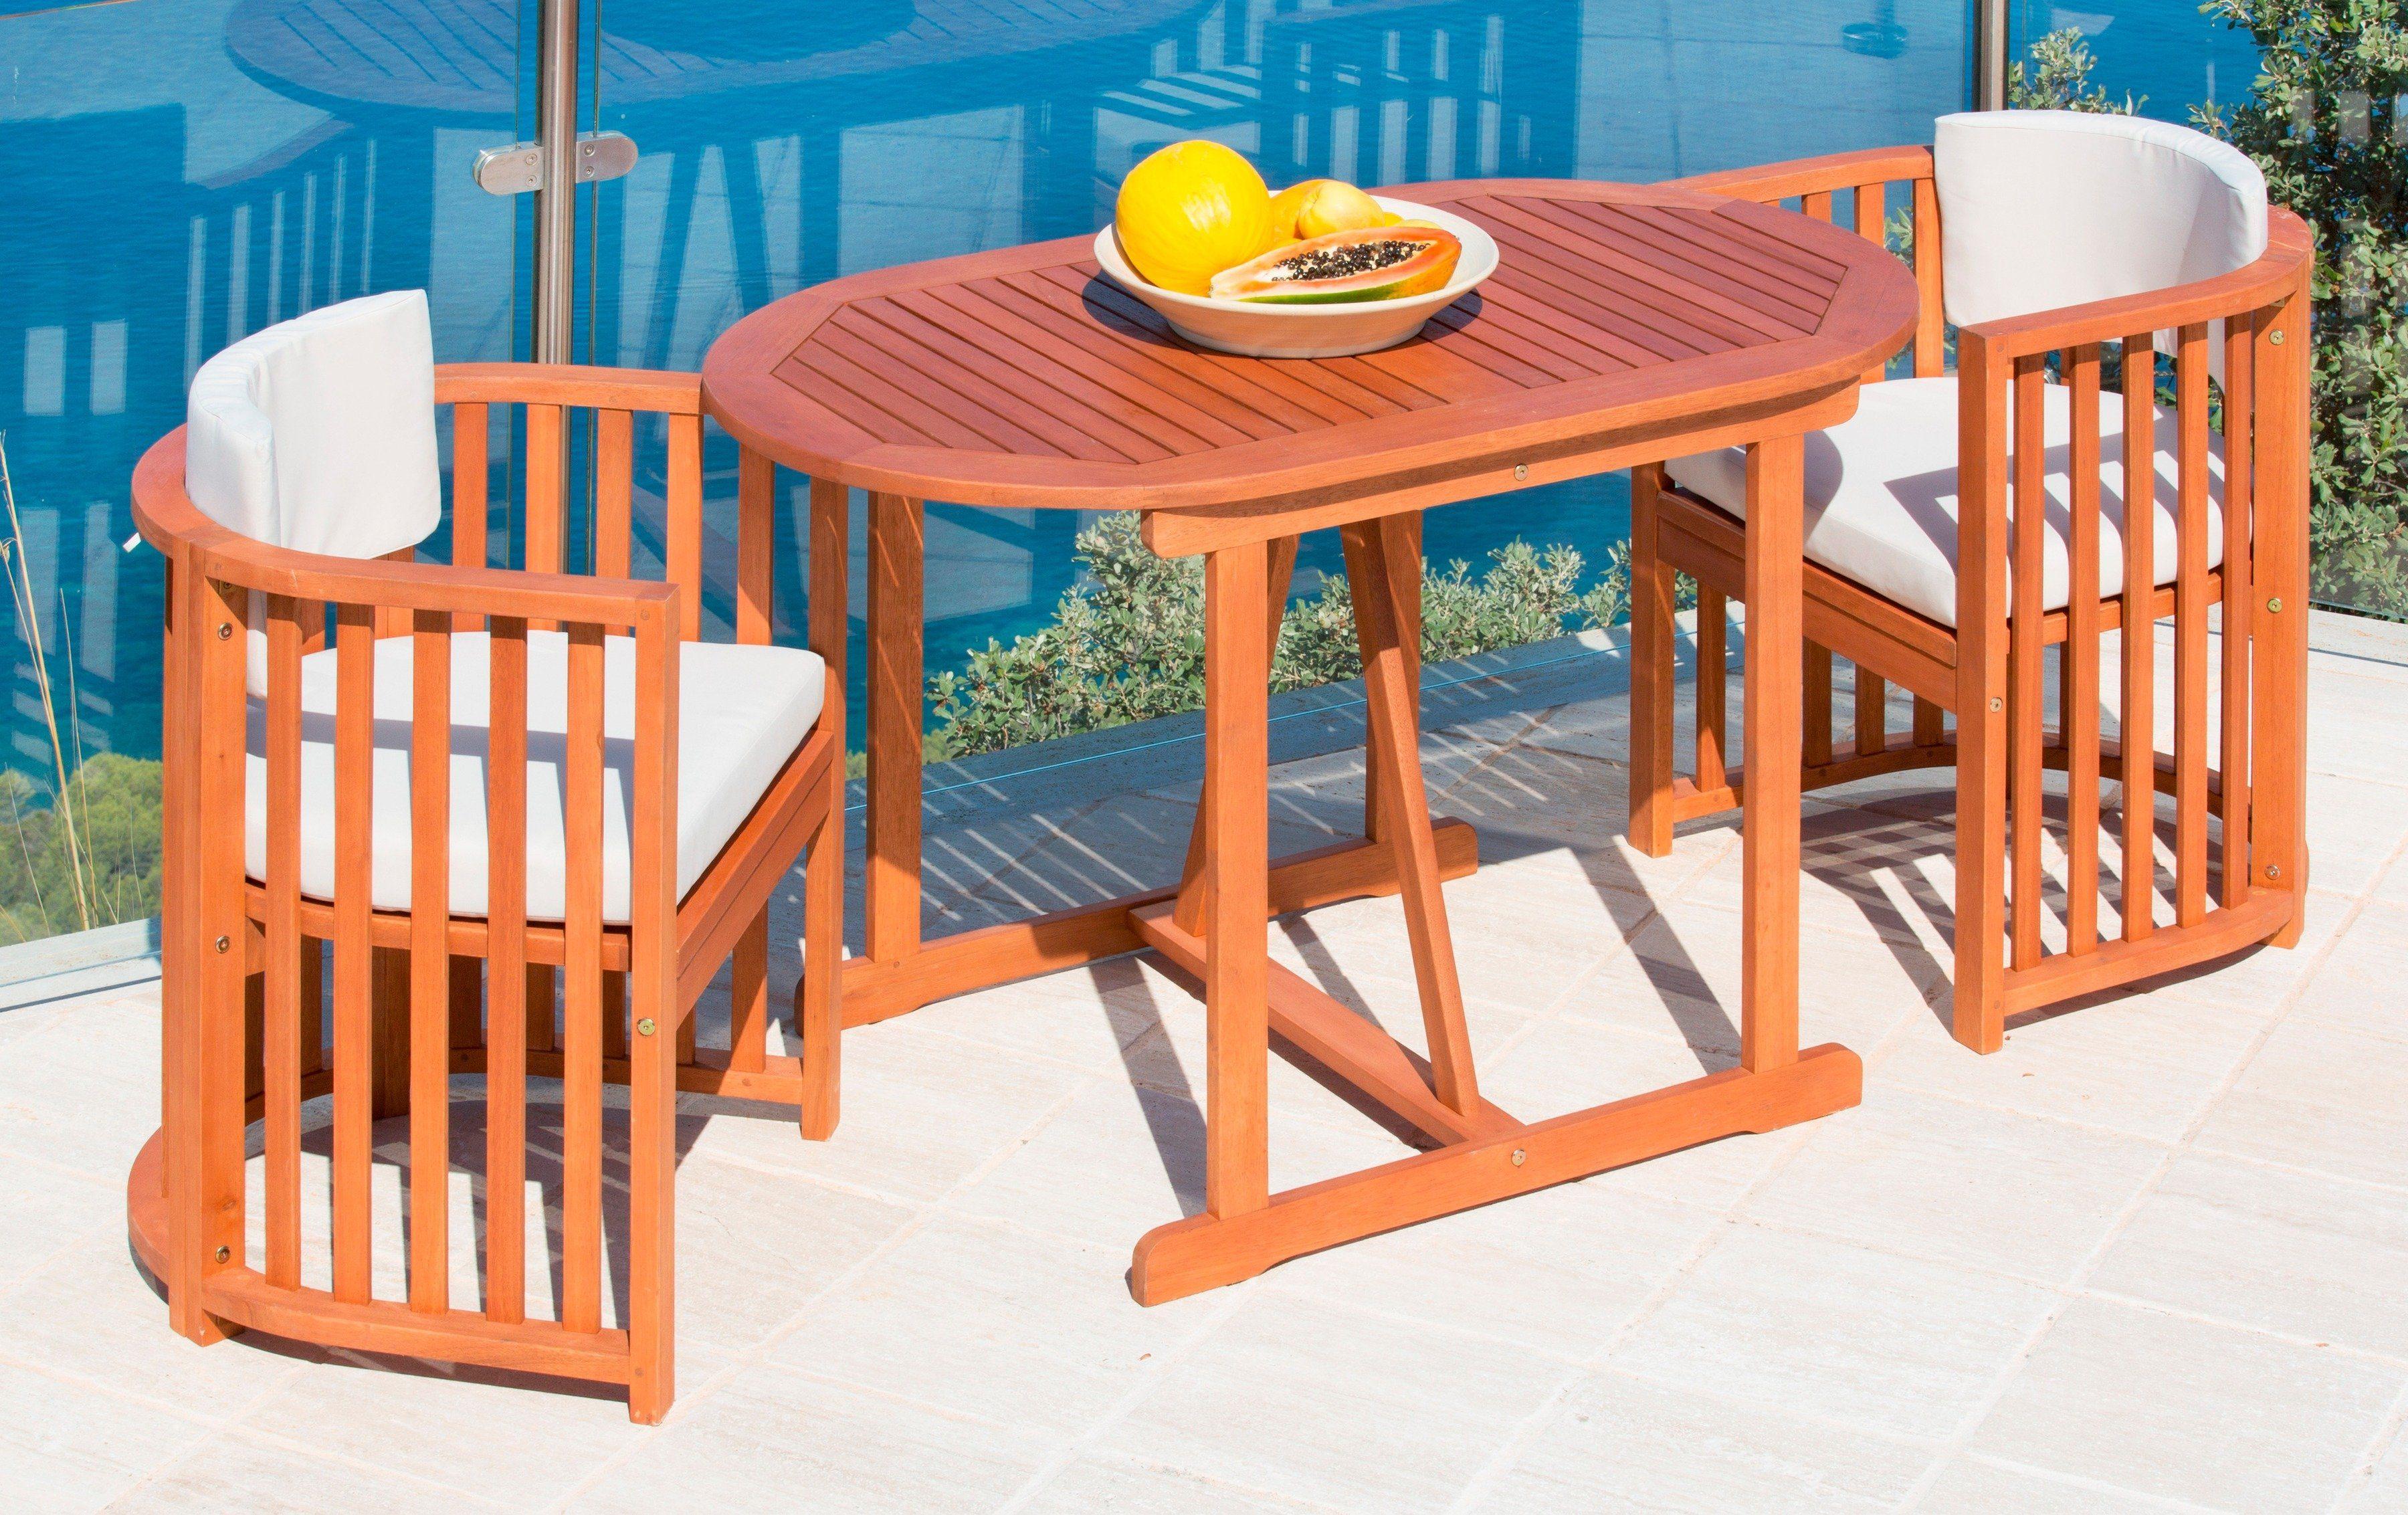 5-tlg. Gartenmöbelset »Brasilia«, 2 Sessel, Tisch 120x70 cm, Eukalyptusholz, inkl. Auflagen